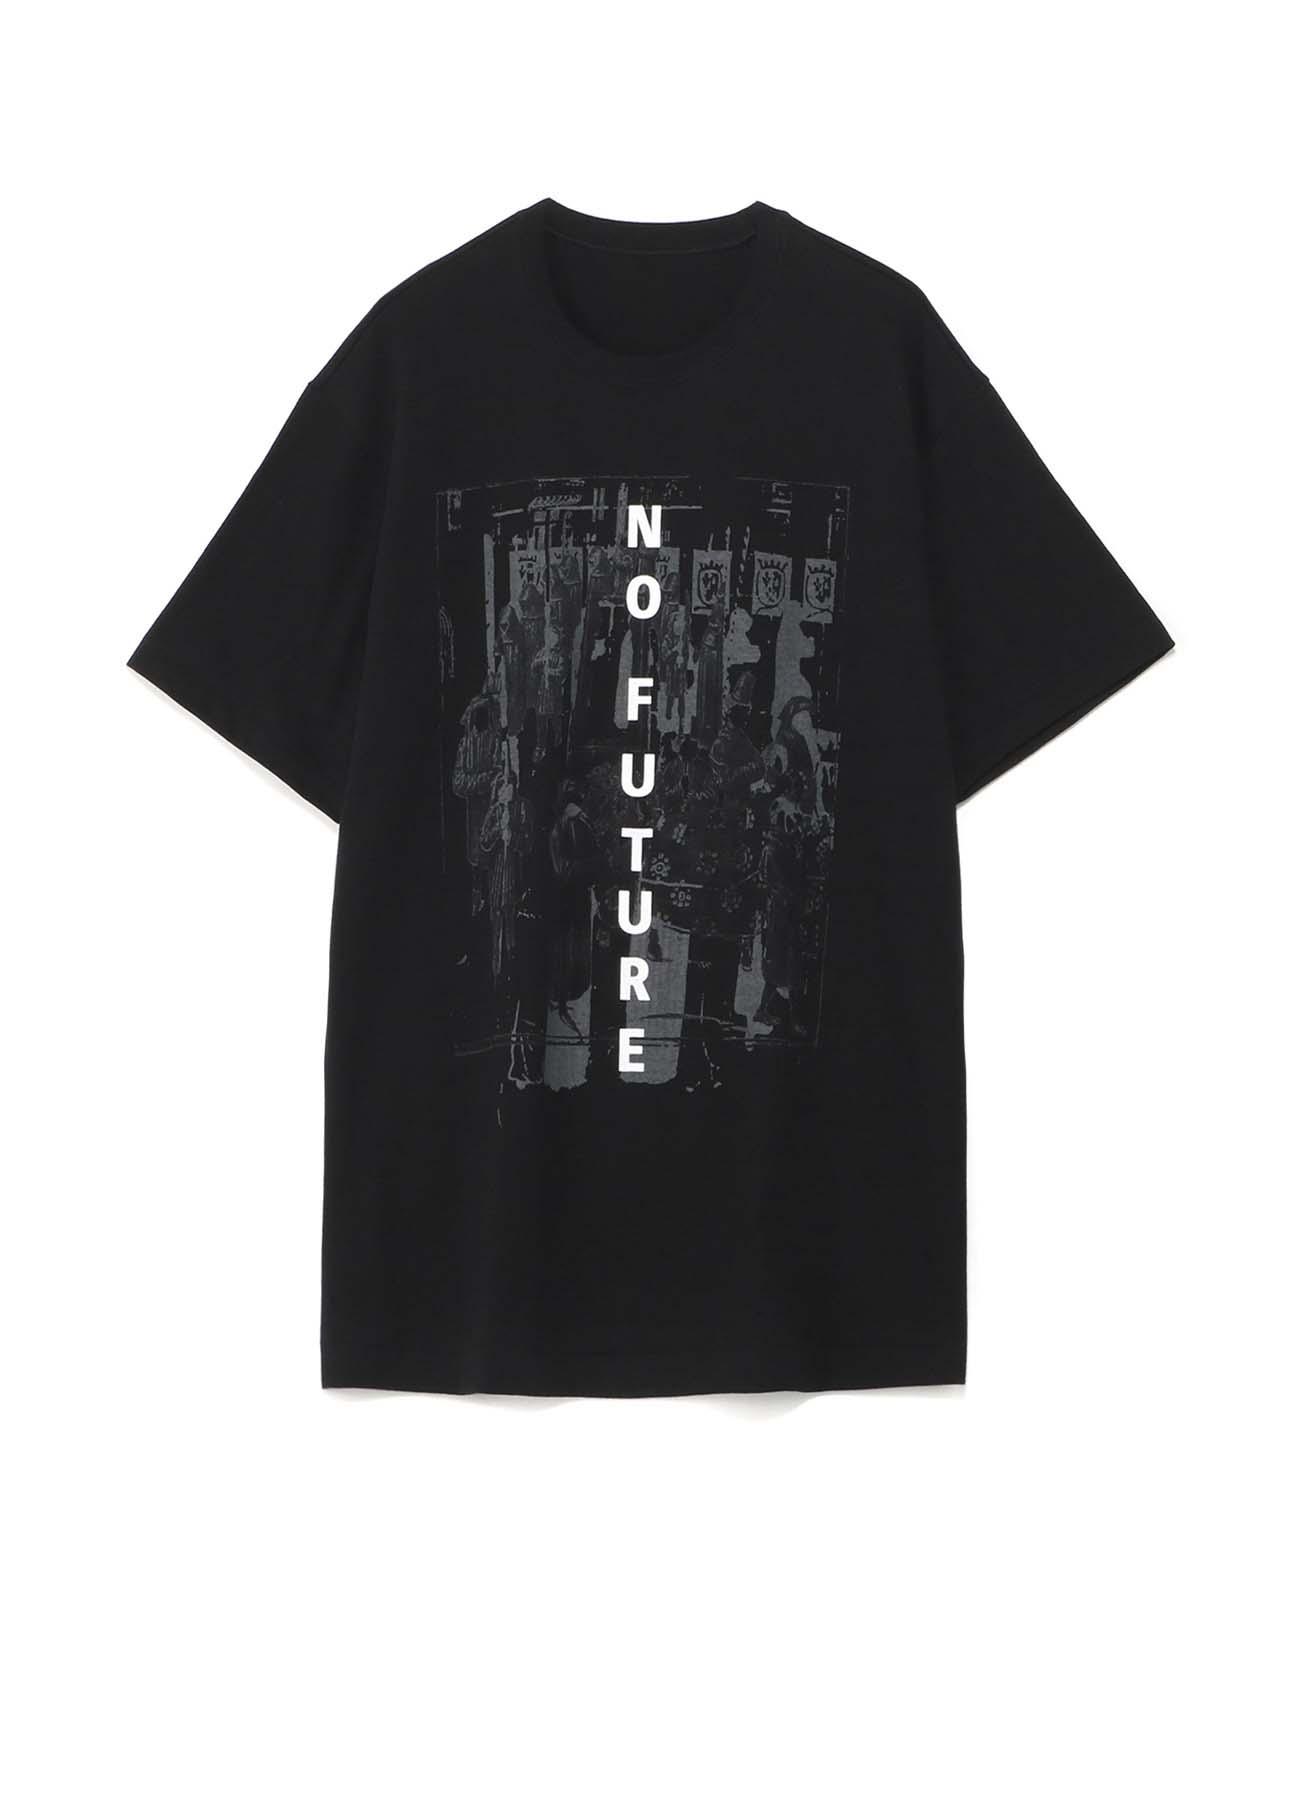 20/CottonJersey [NO FUTURE] T-Shirt